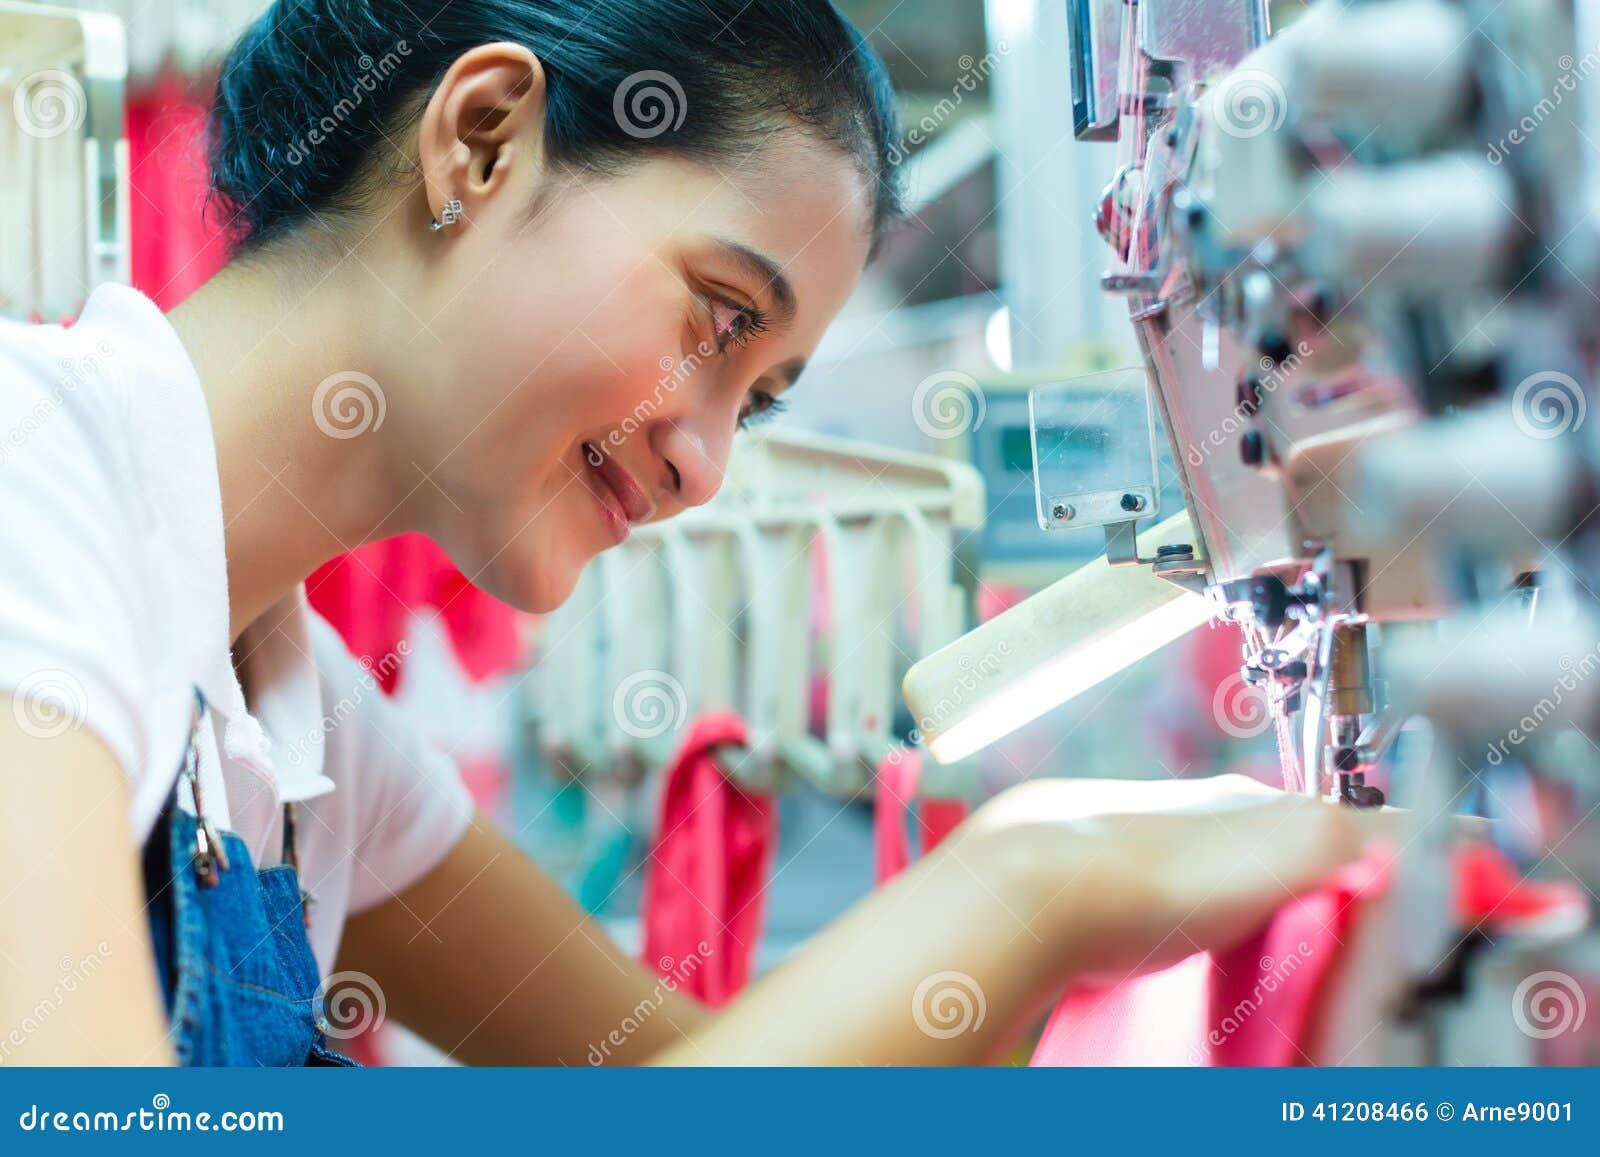 Find Asian Textile 91